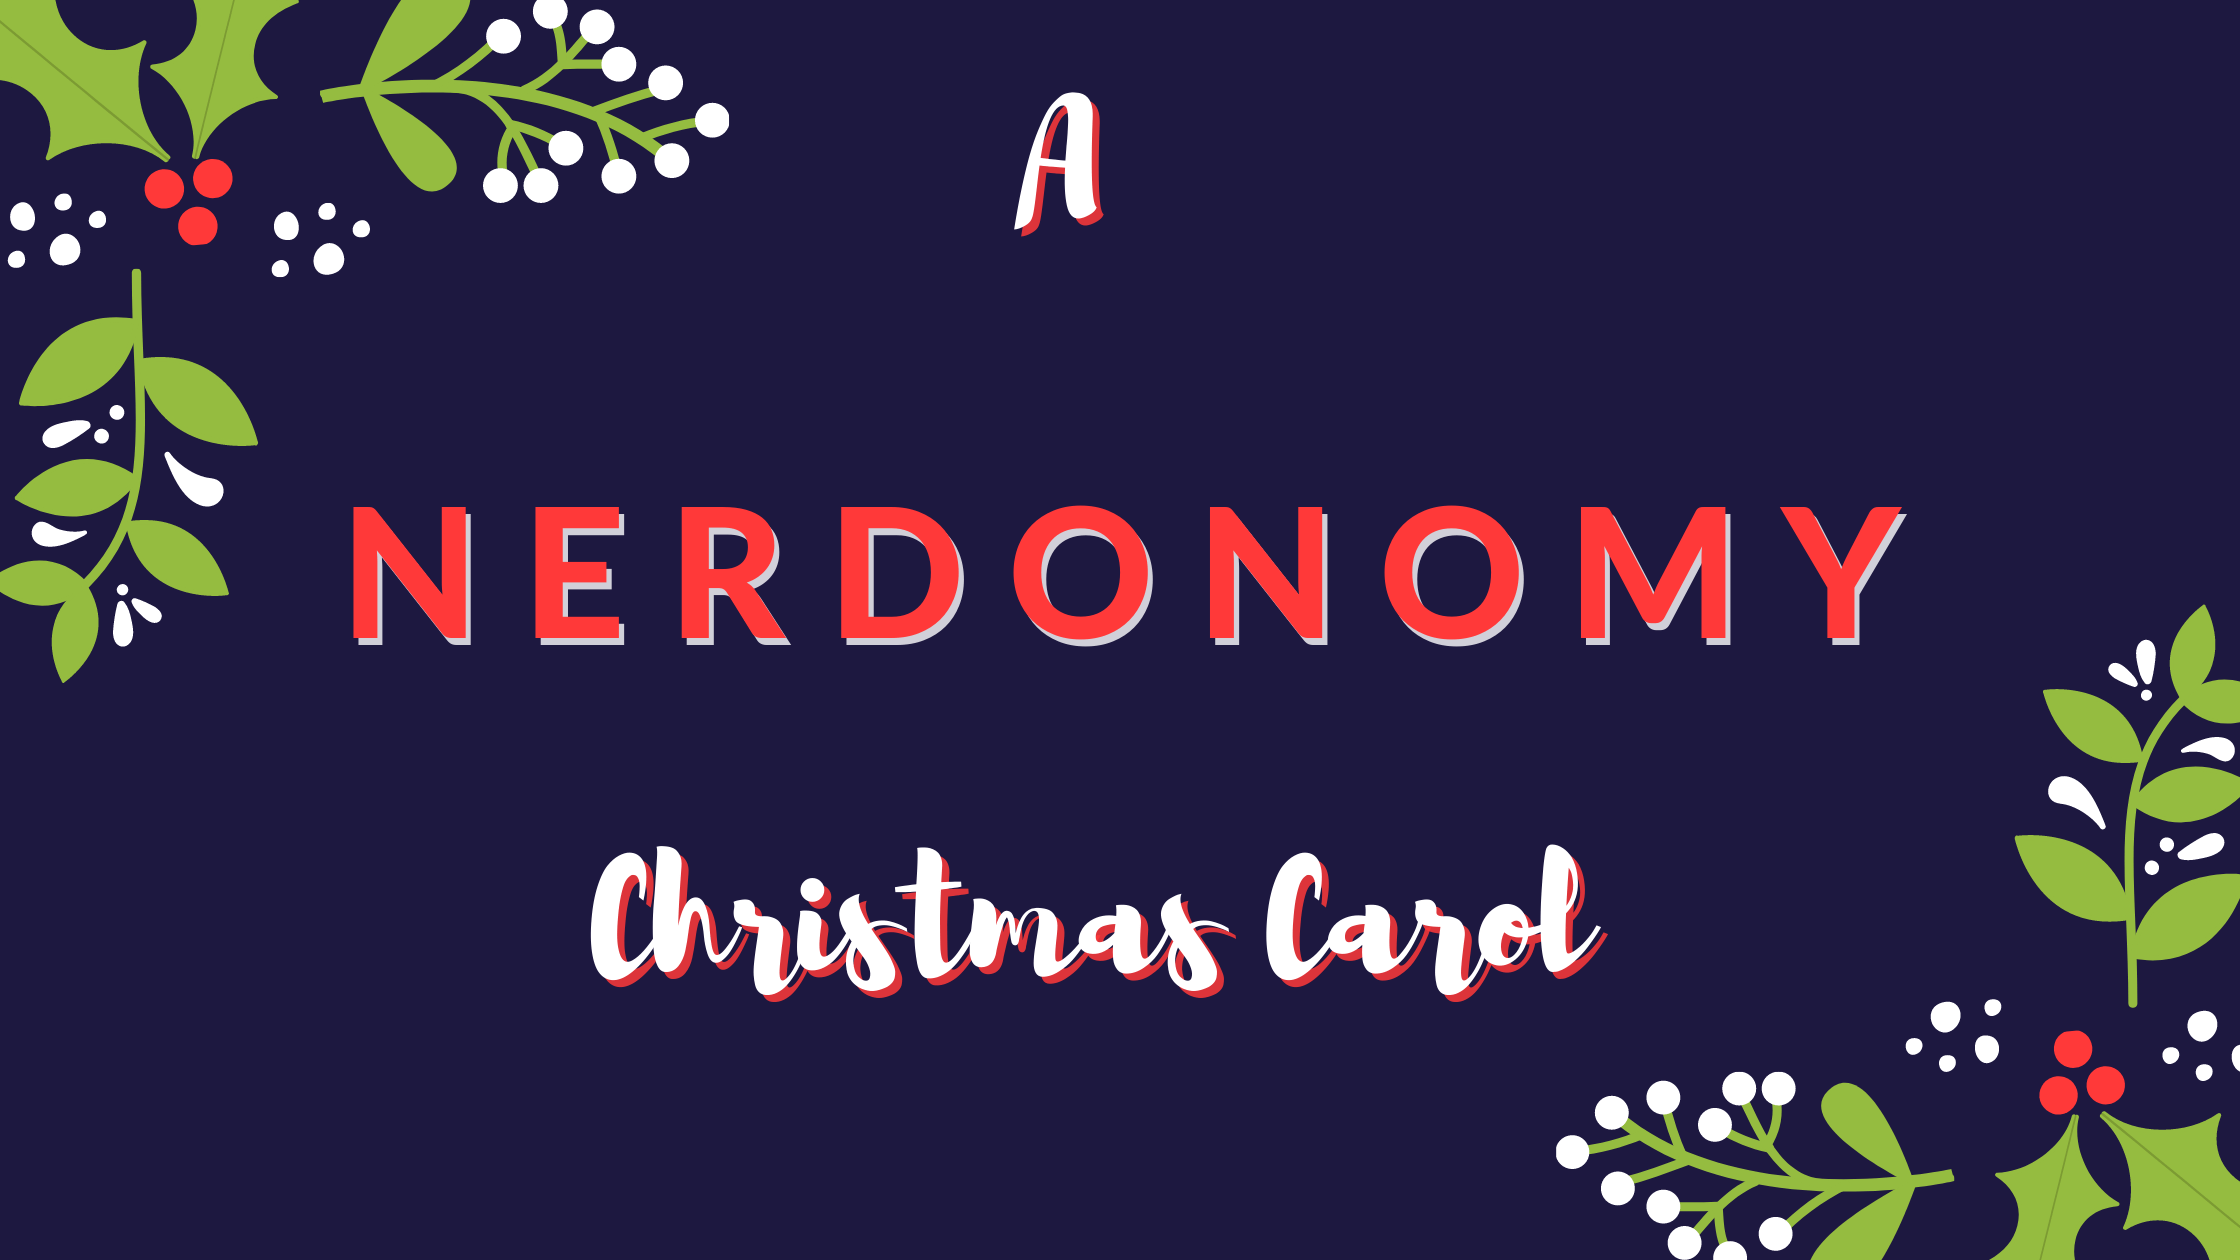 Nerdonomy Christmas Carol Cover Art